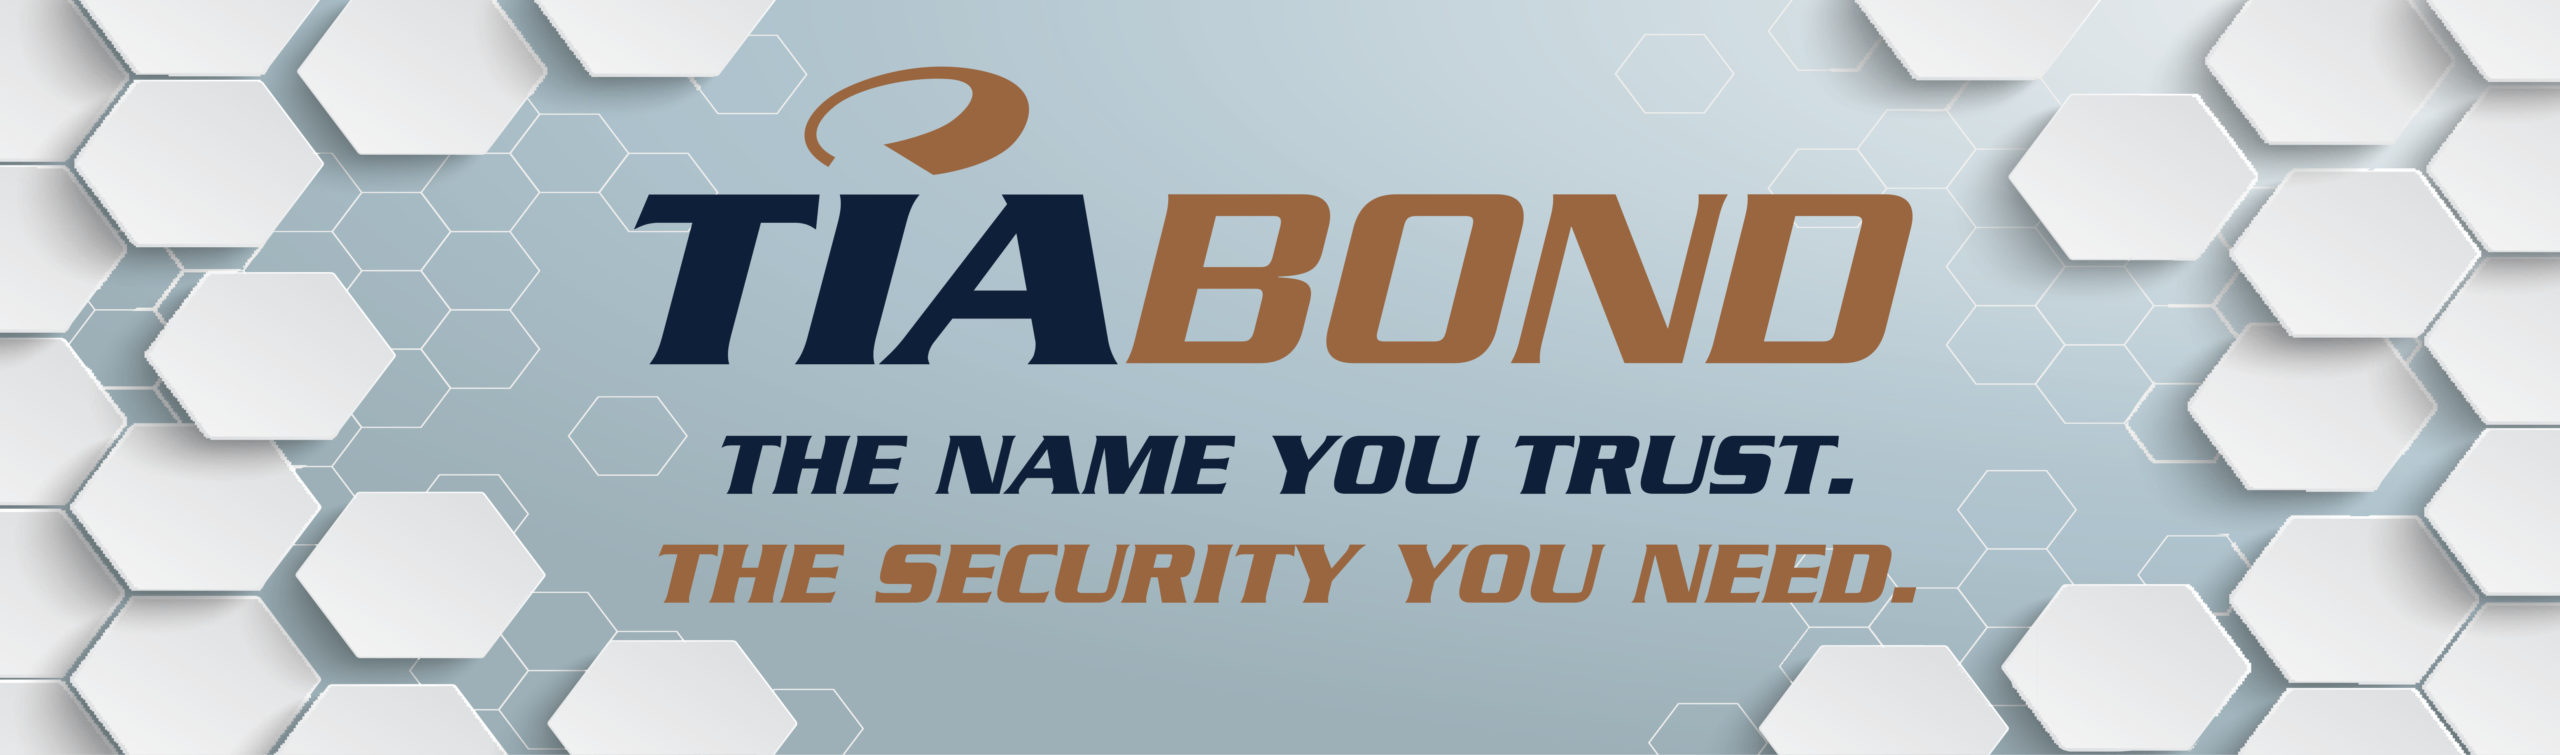 Header - TIA Bond (2021-5)